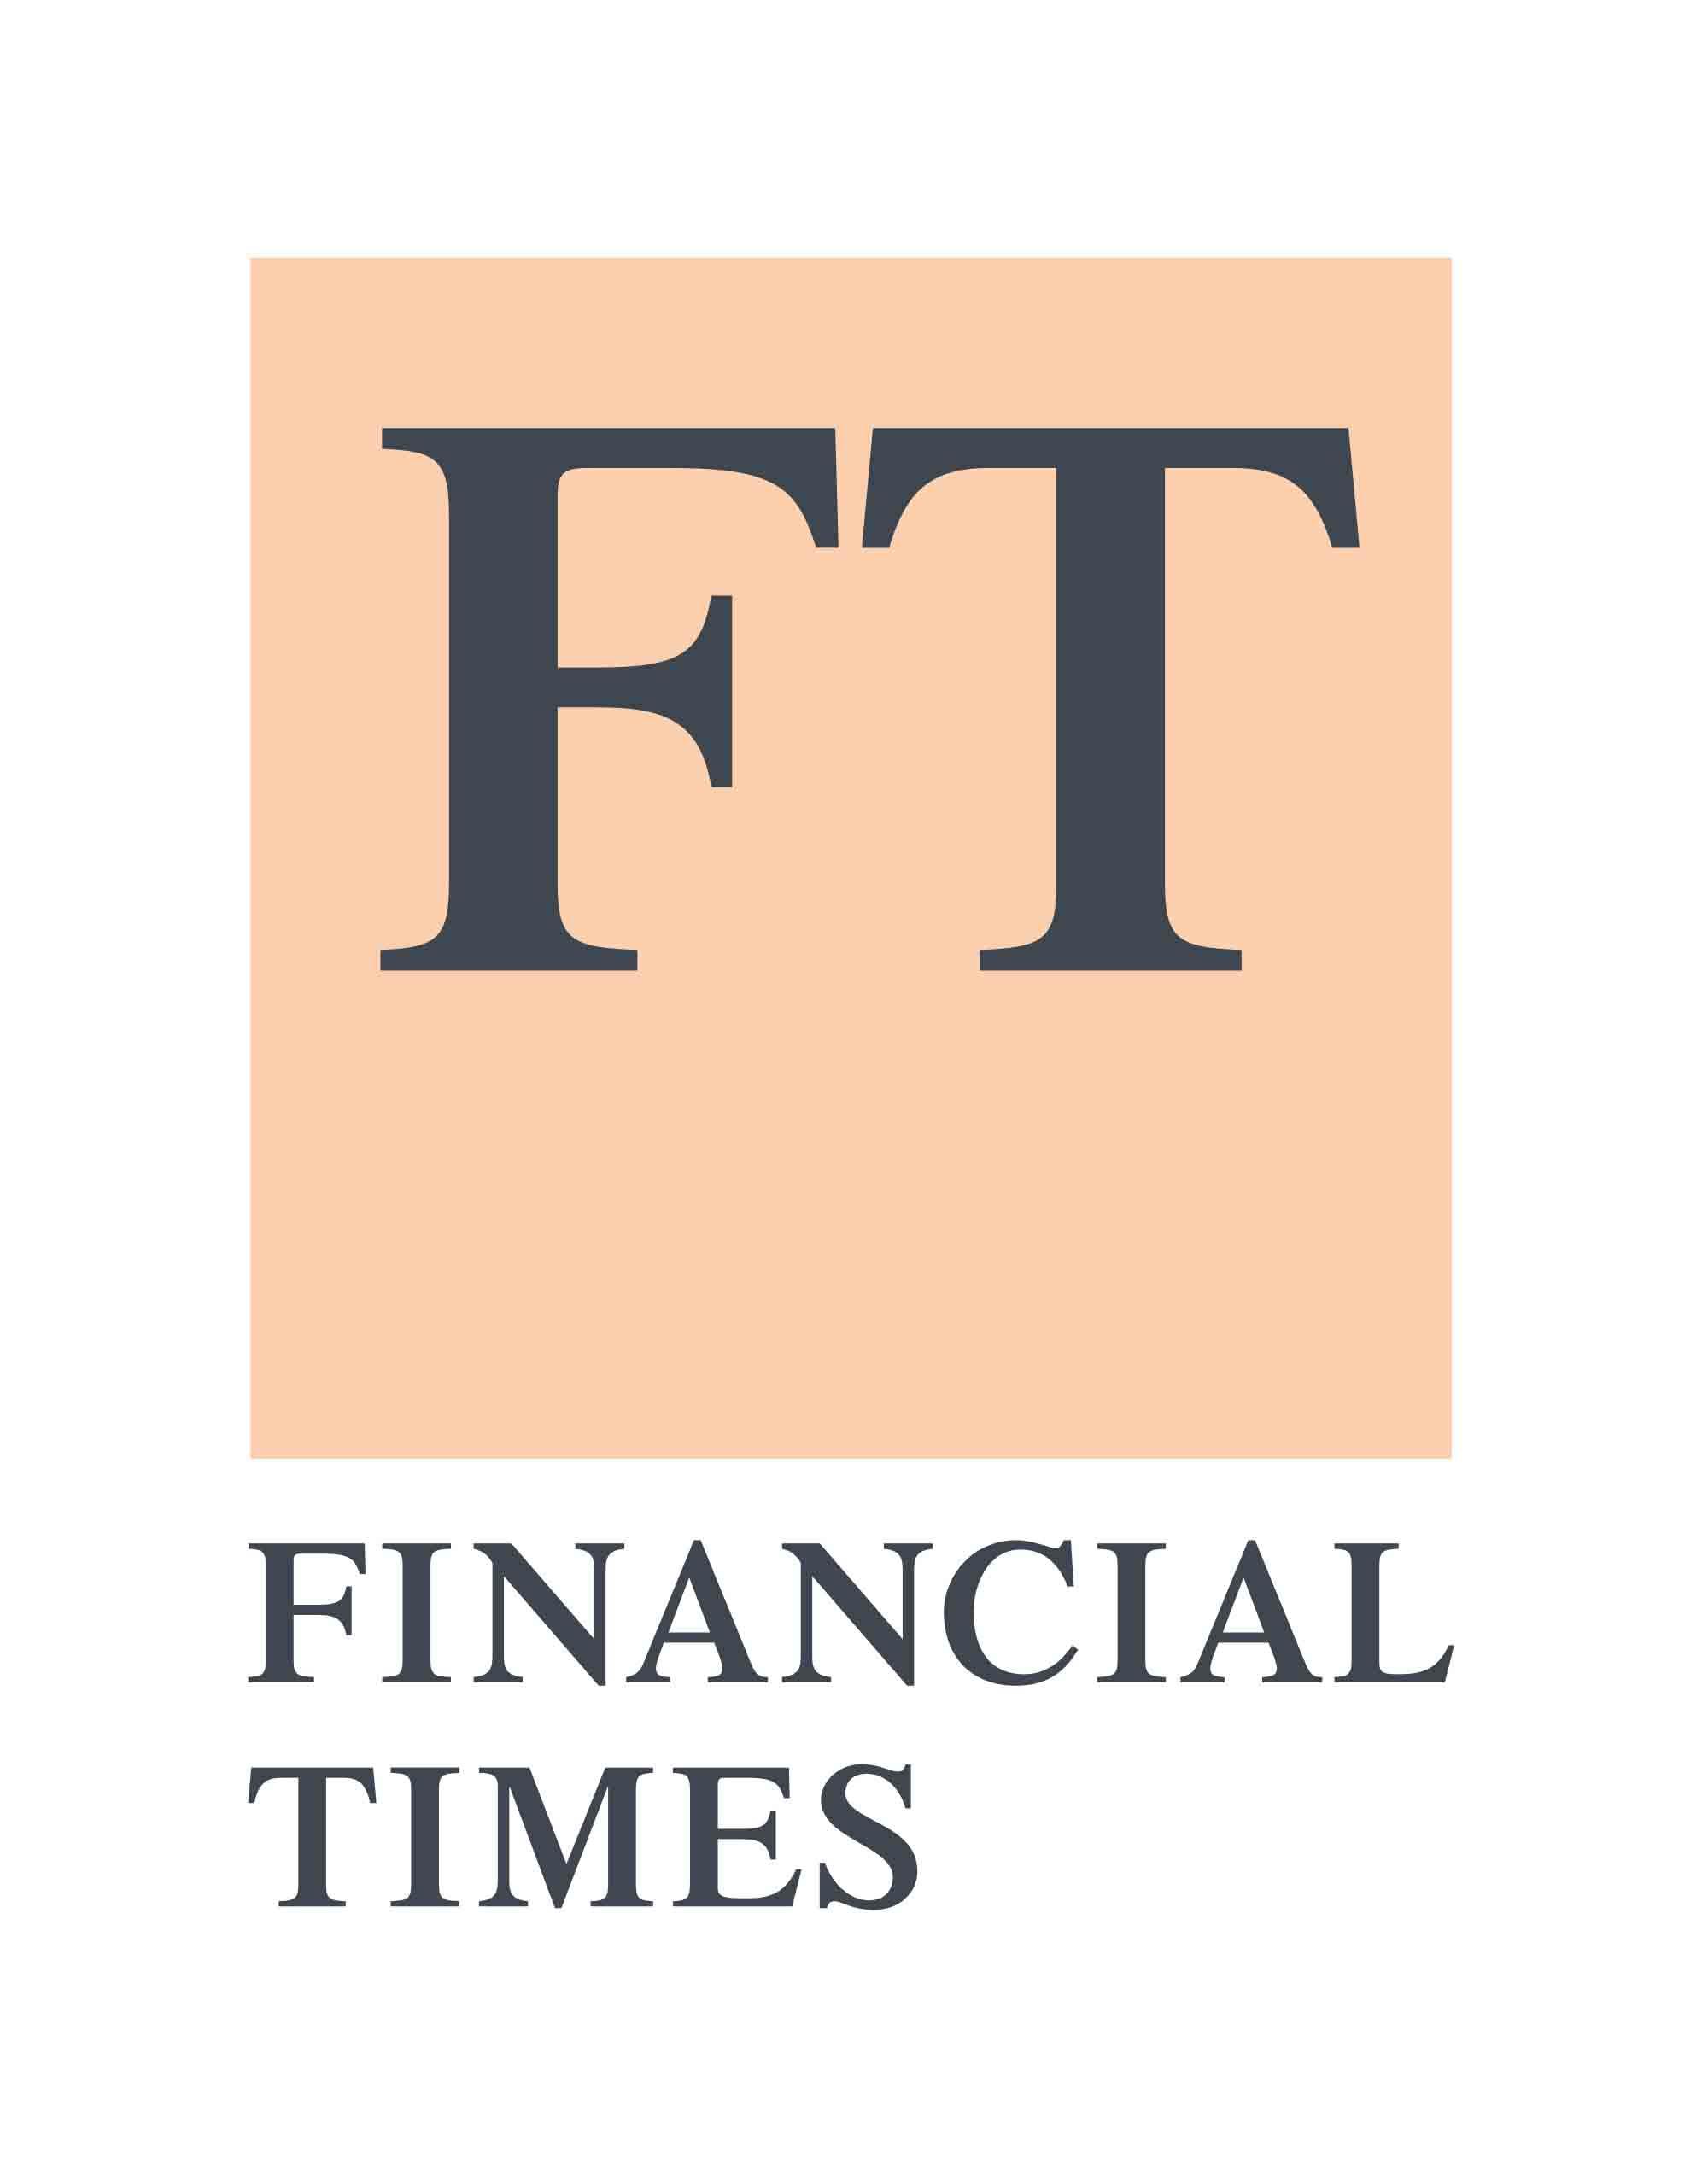 2000px-Financial_Times_corporate_logo.jpg